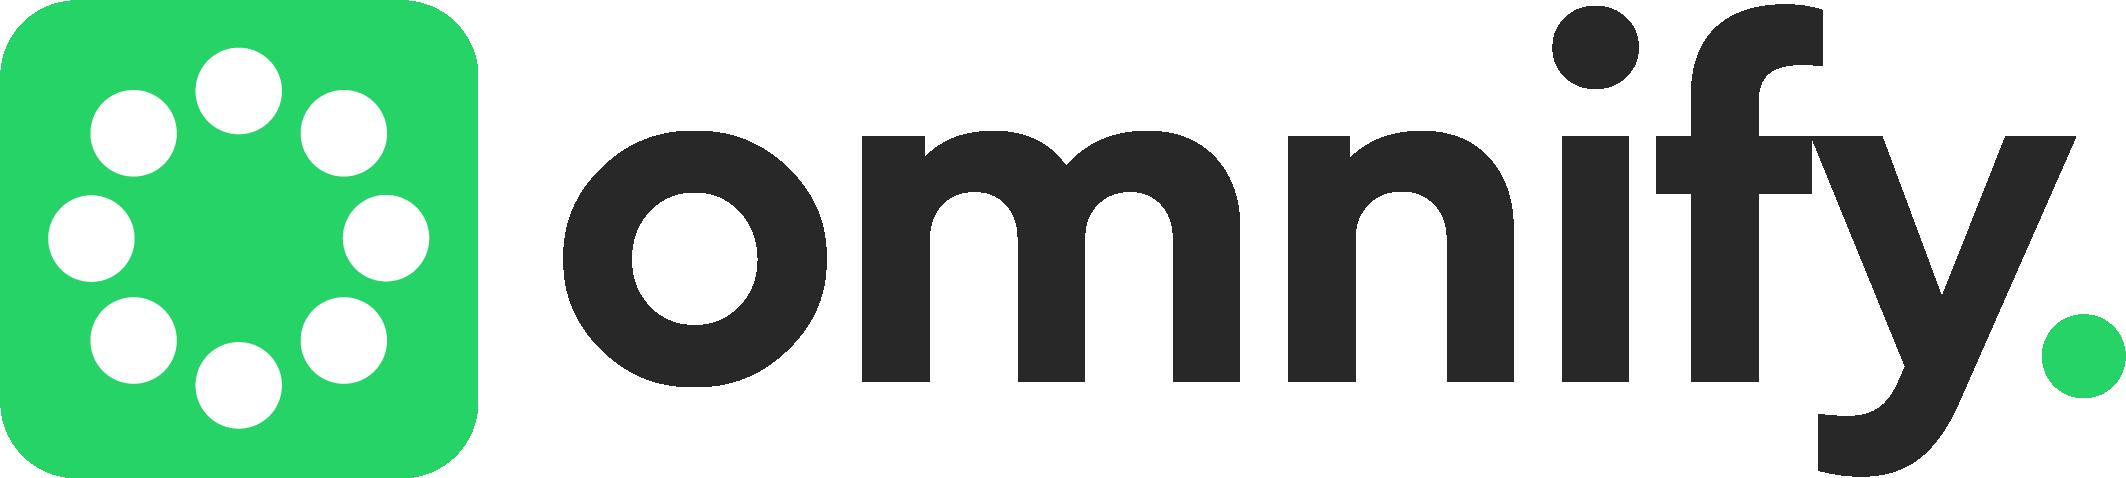 Omnify's dark logo